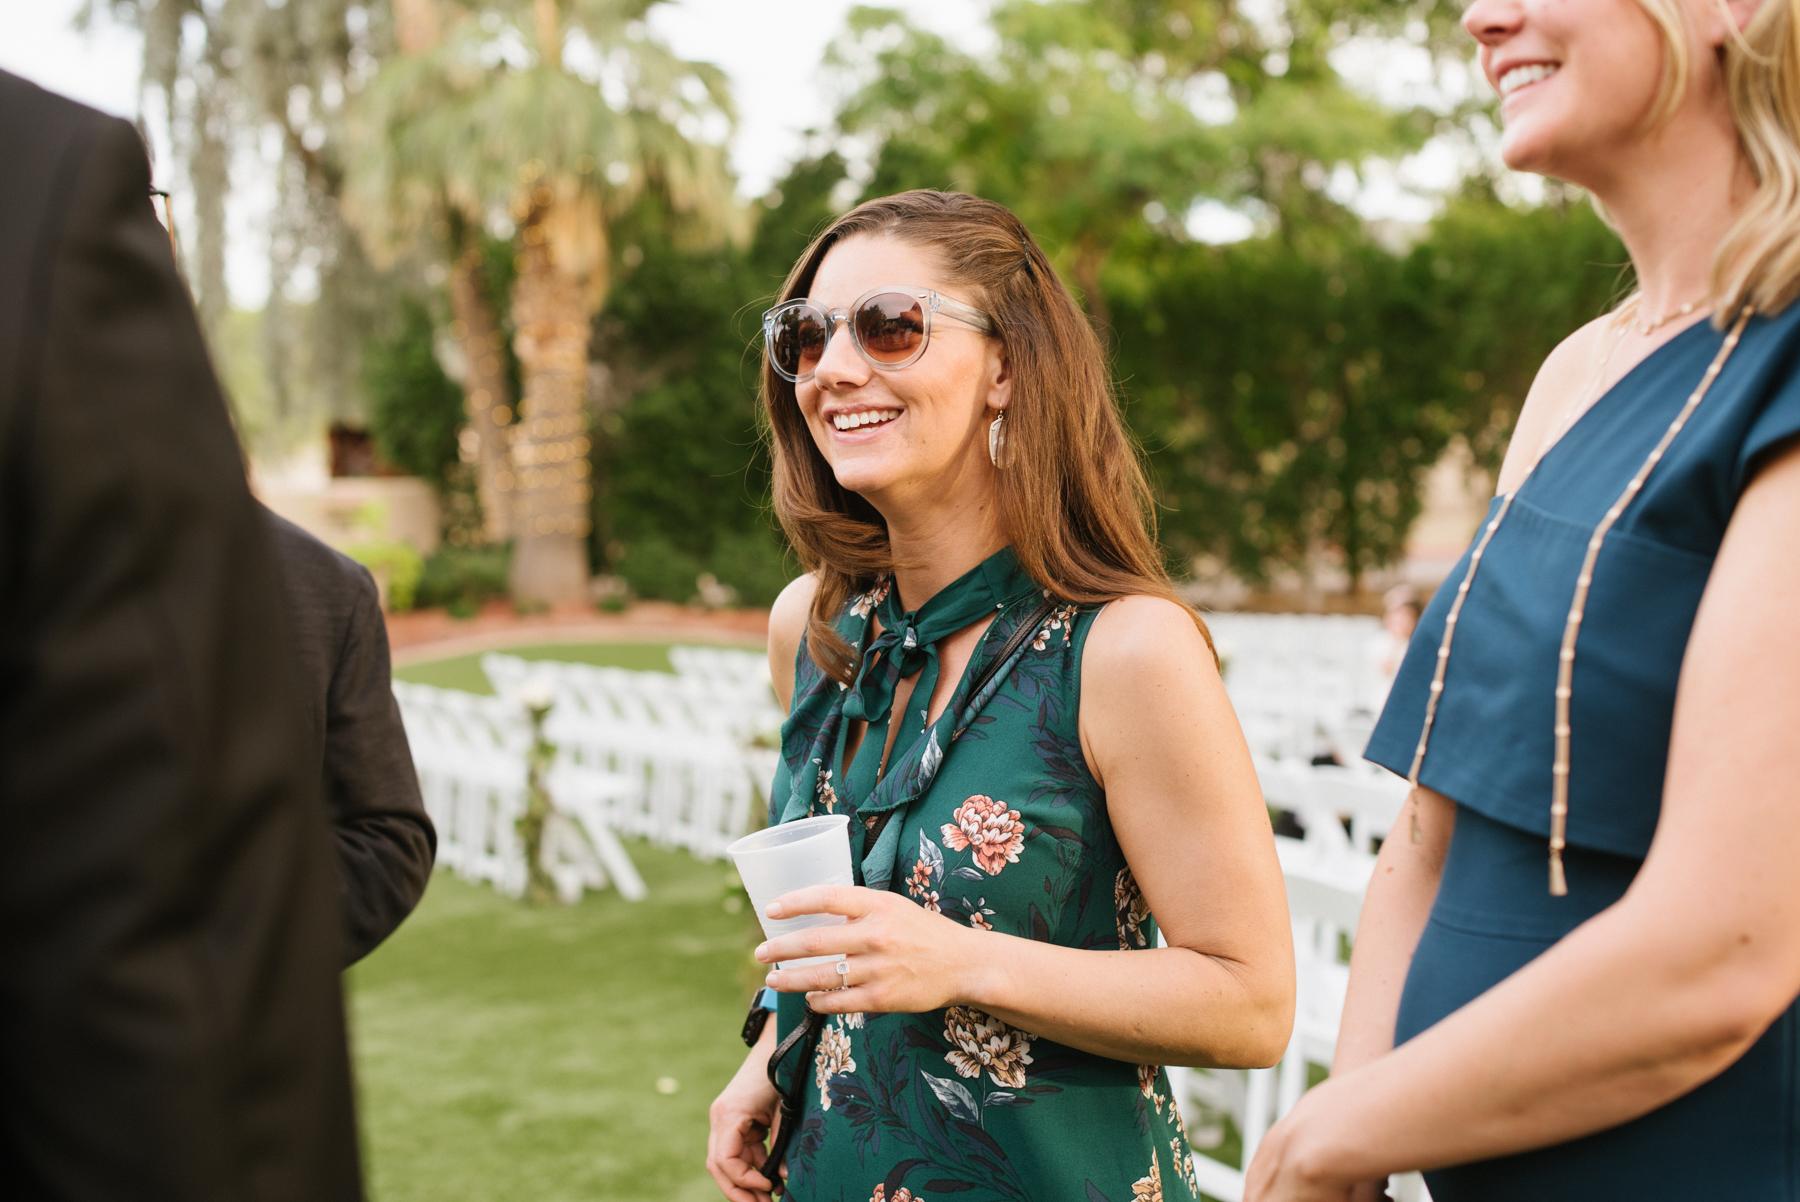 Secret Garden Event Center Wedding - Meredith Amadee Photography-1-4.jpg